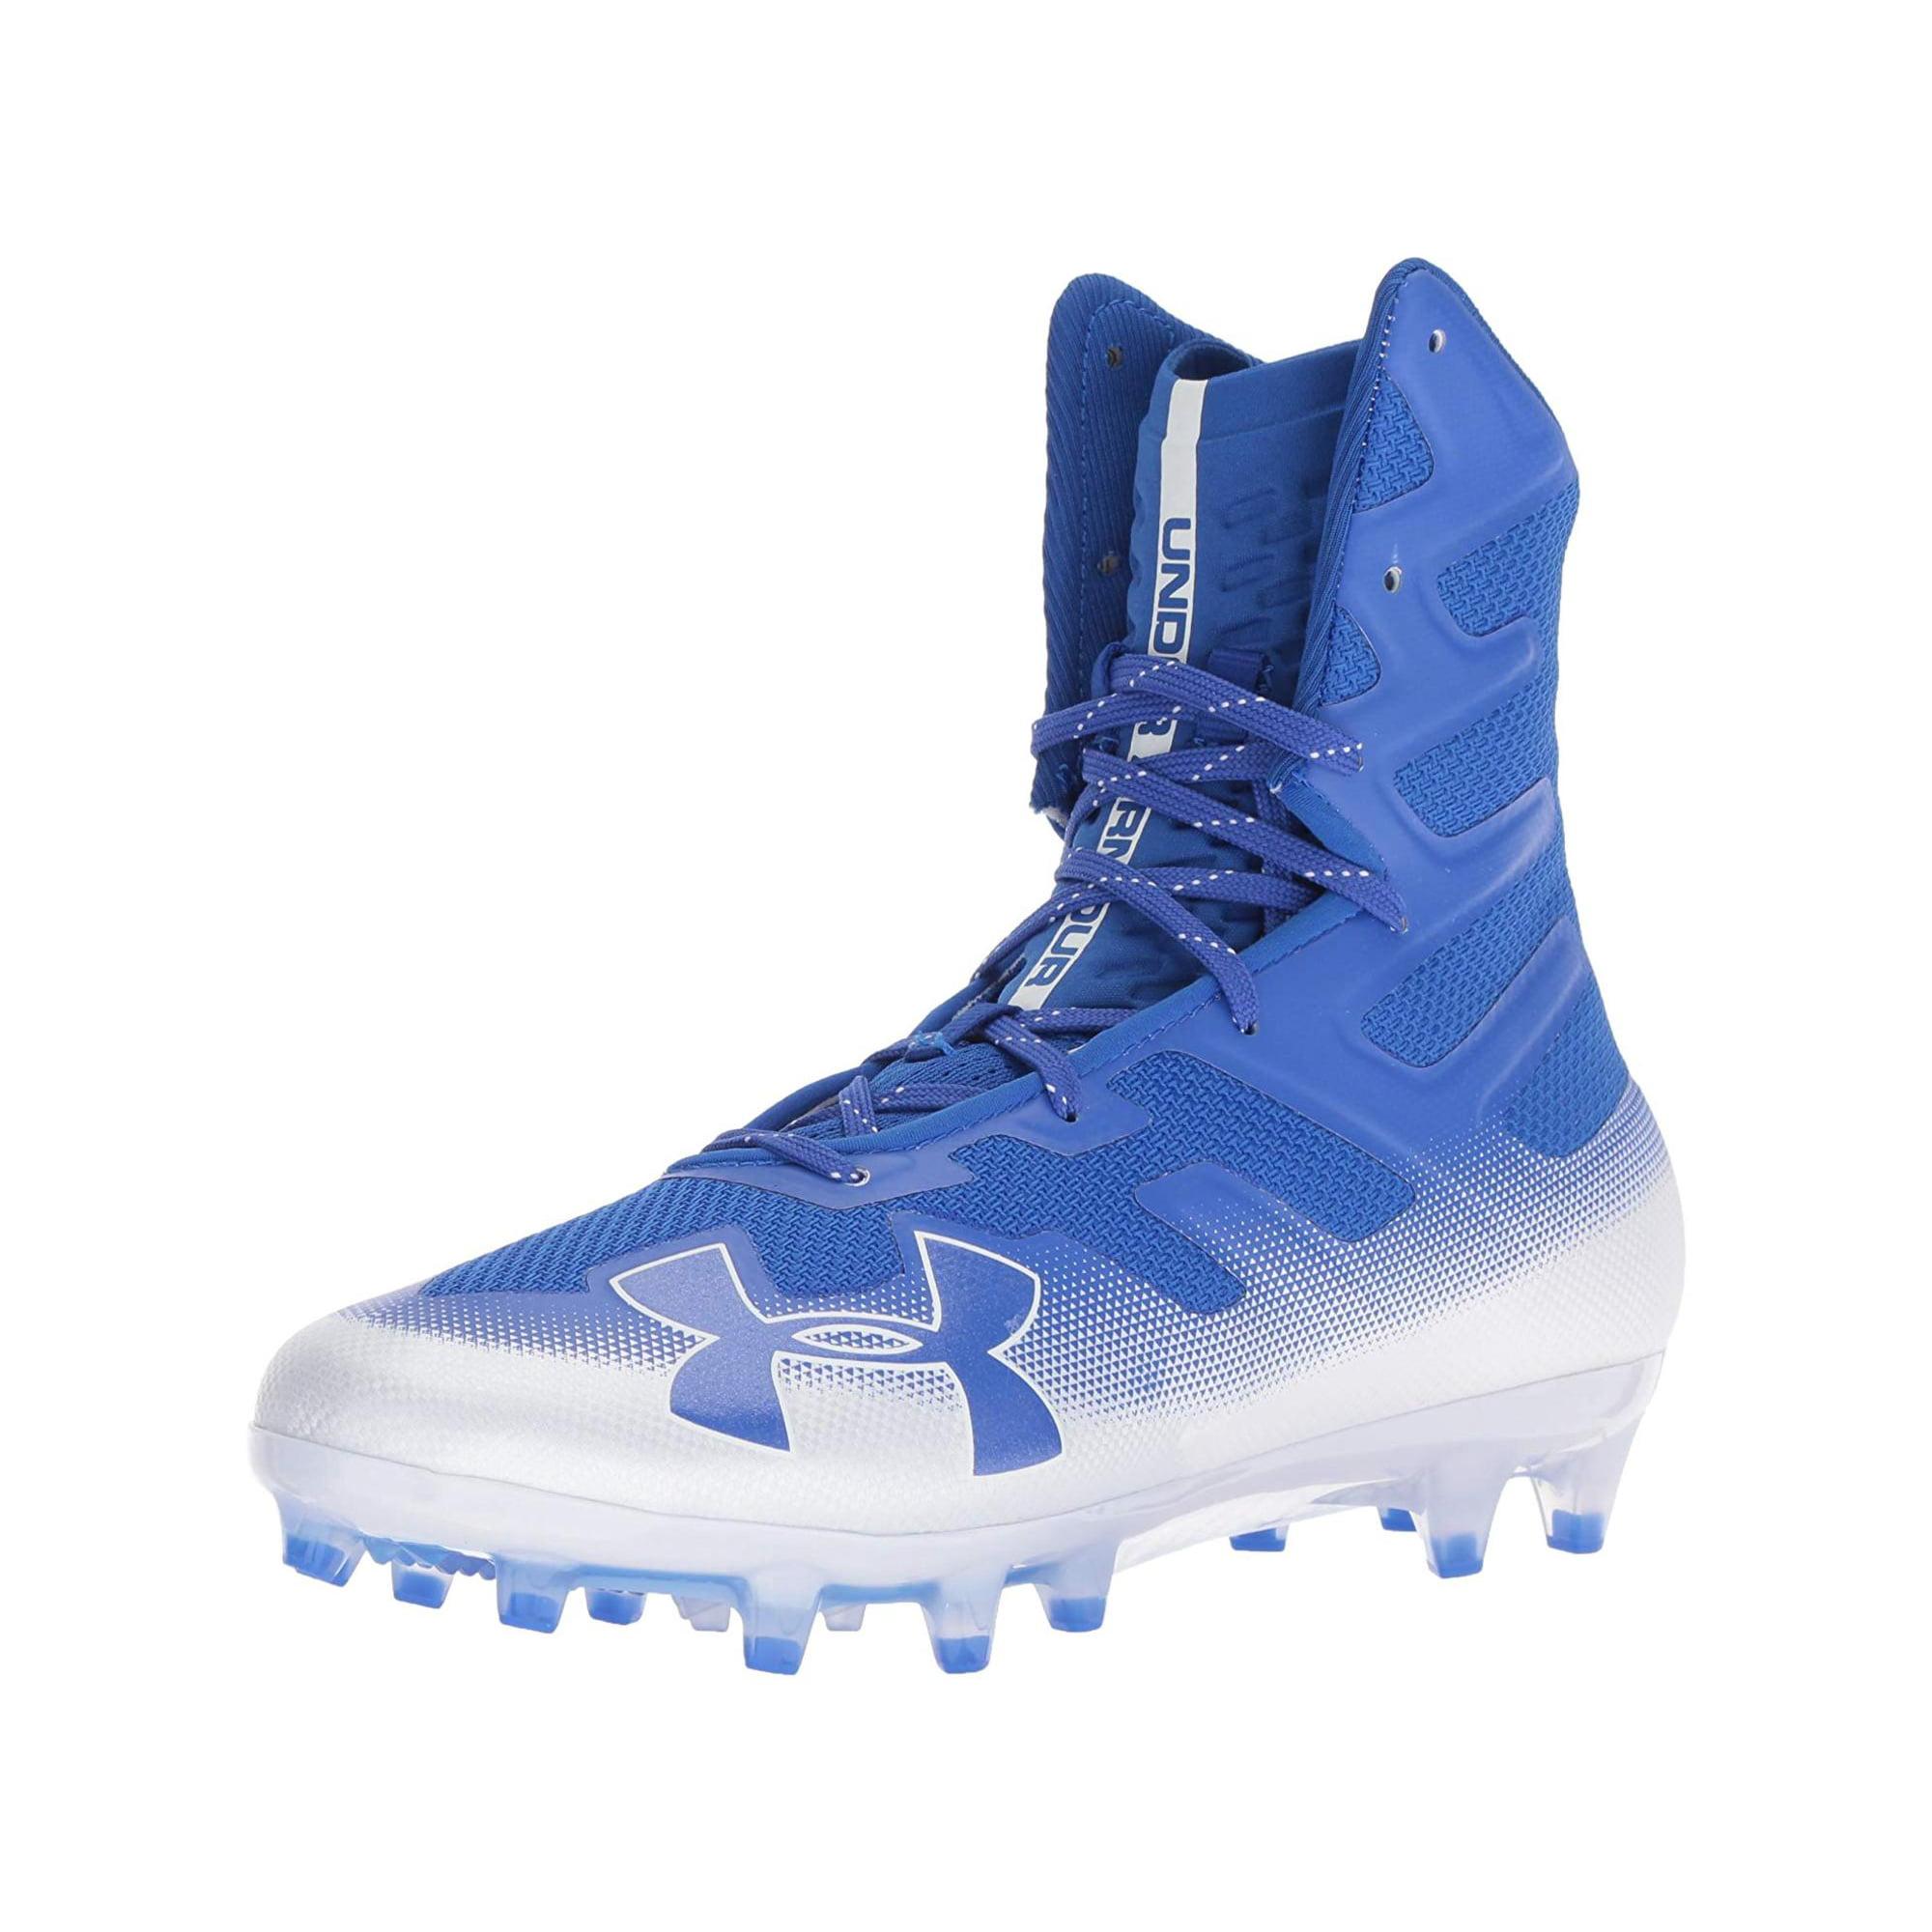 61955951039 Under Armour Men s Highlight Mc Football Shoe